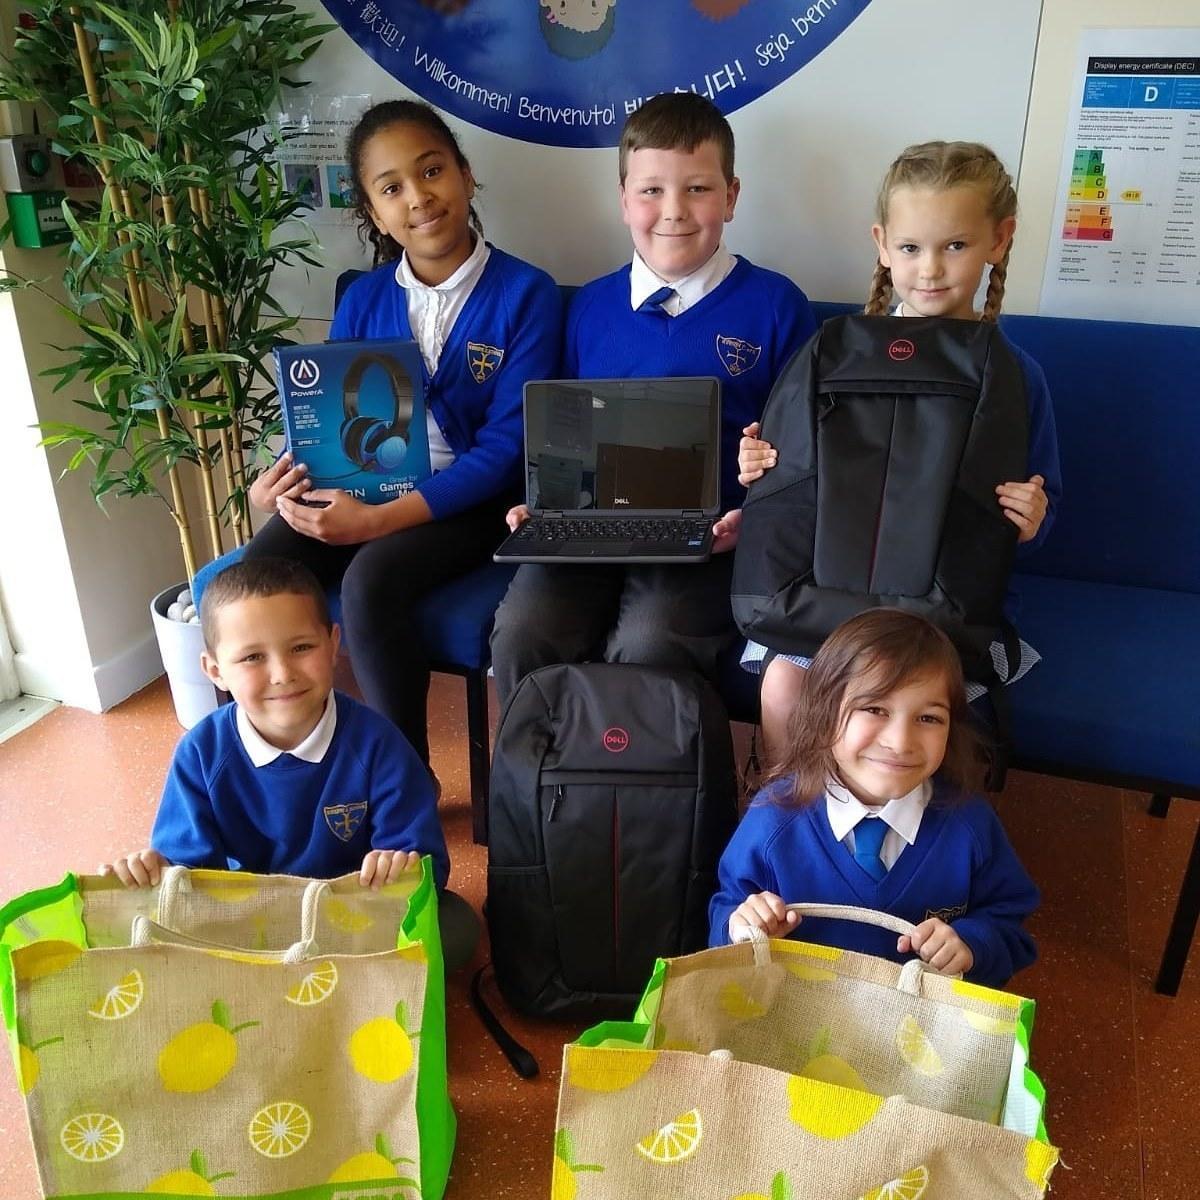 Pupils love new laptops from Asda | Asda Aintree